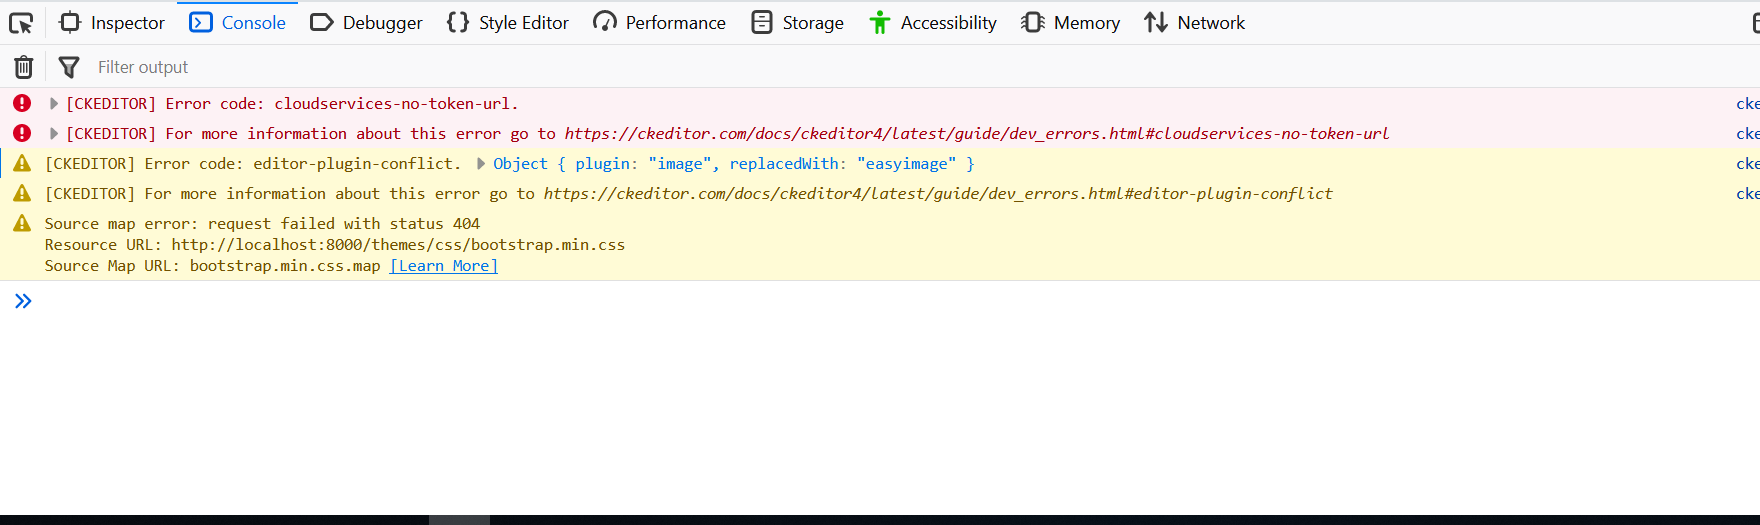 Oracle11gR2 LPX Invalid token in: '~S'